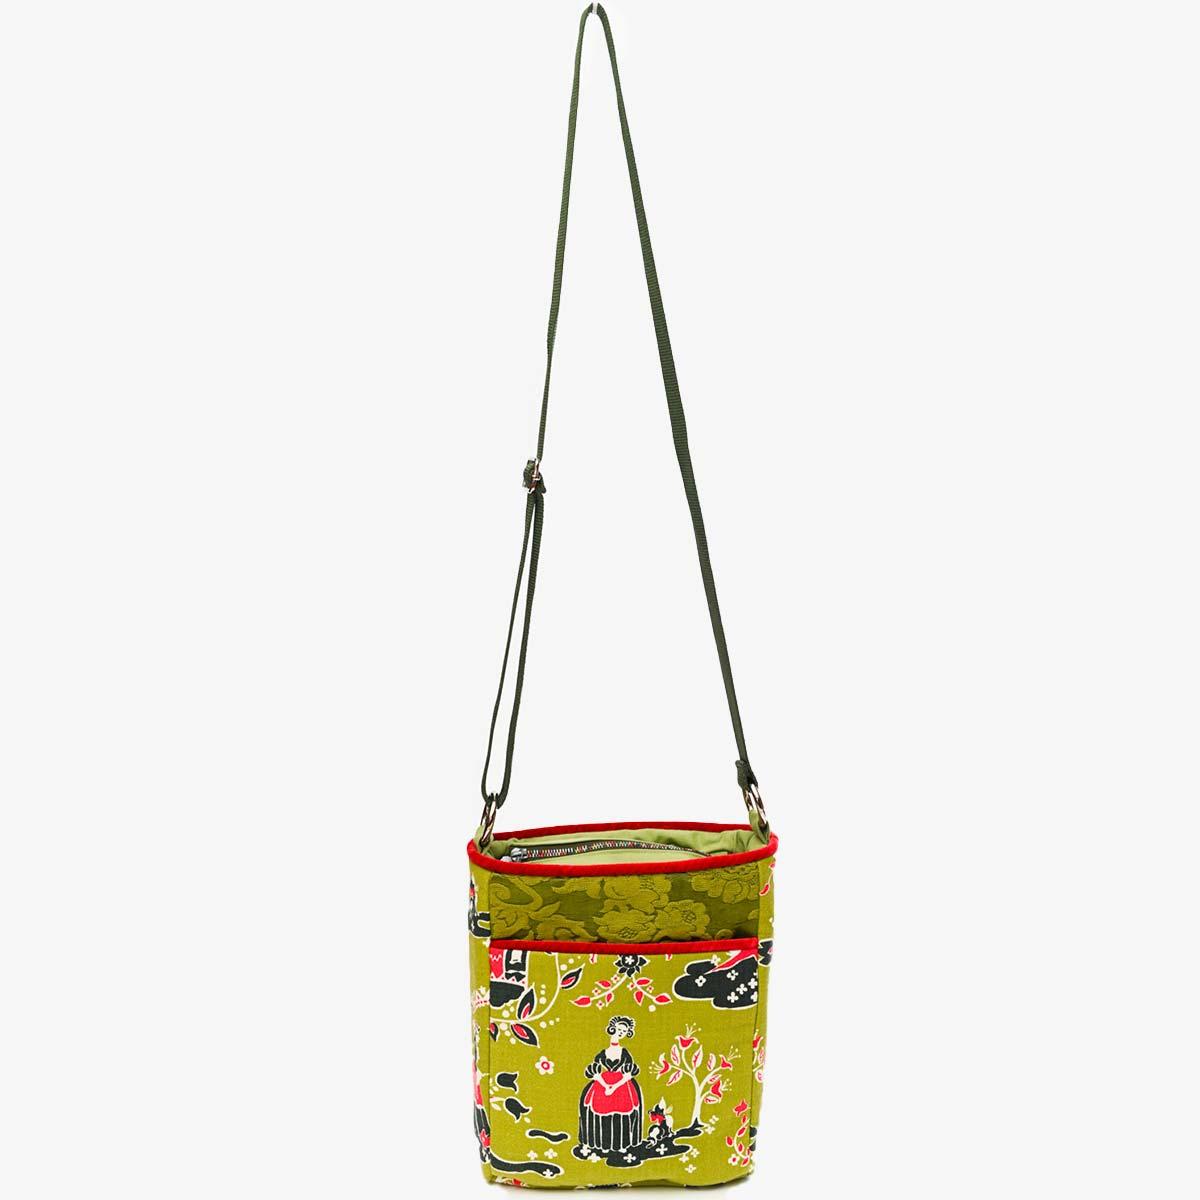 crossbody bag folk motif on avocado DSC 6576